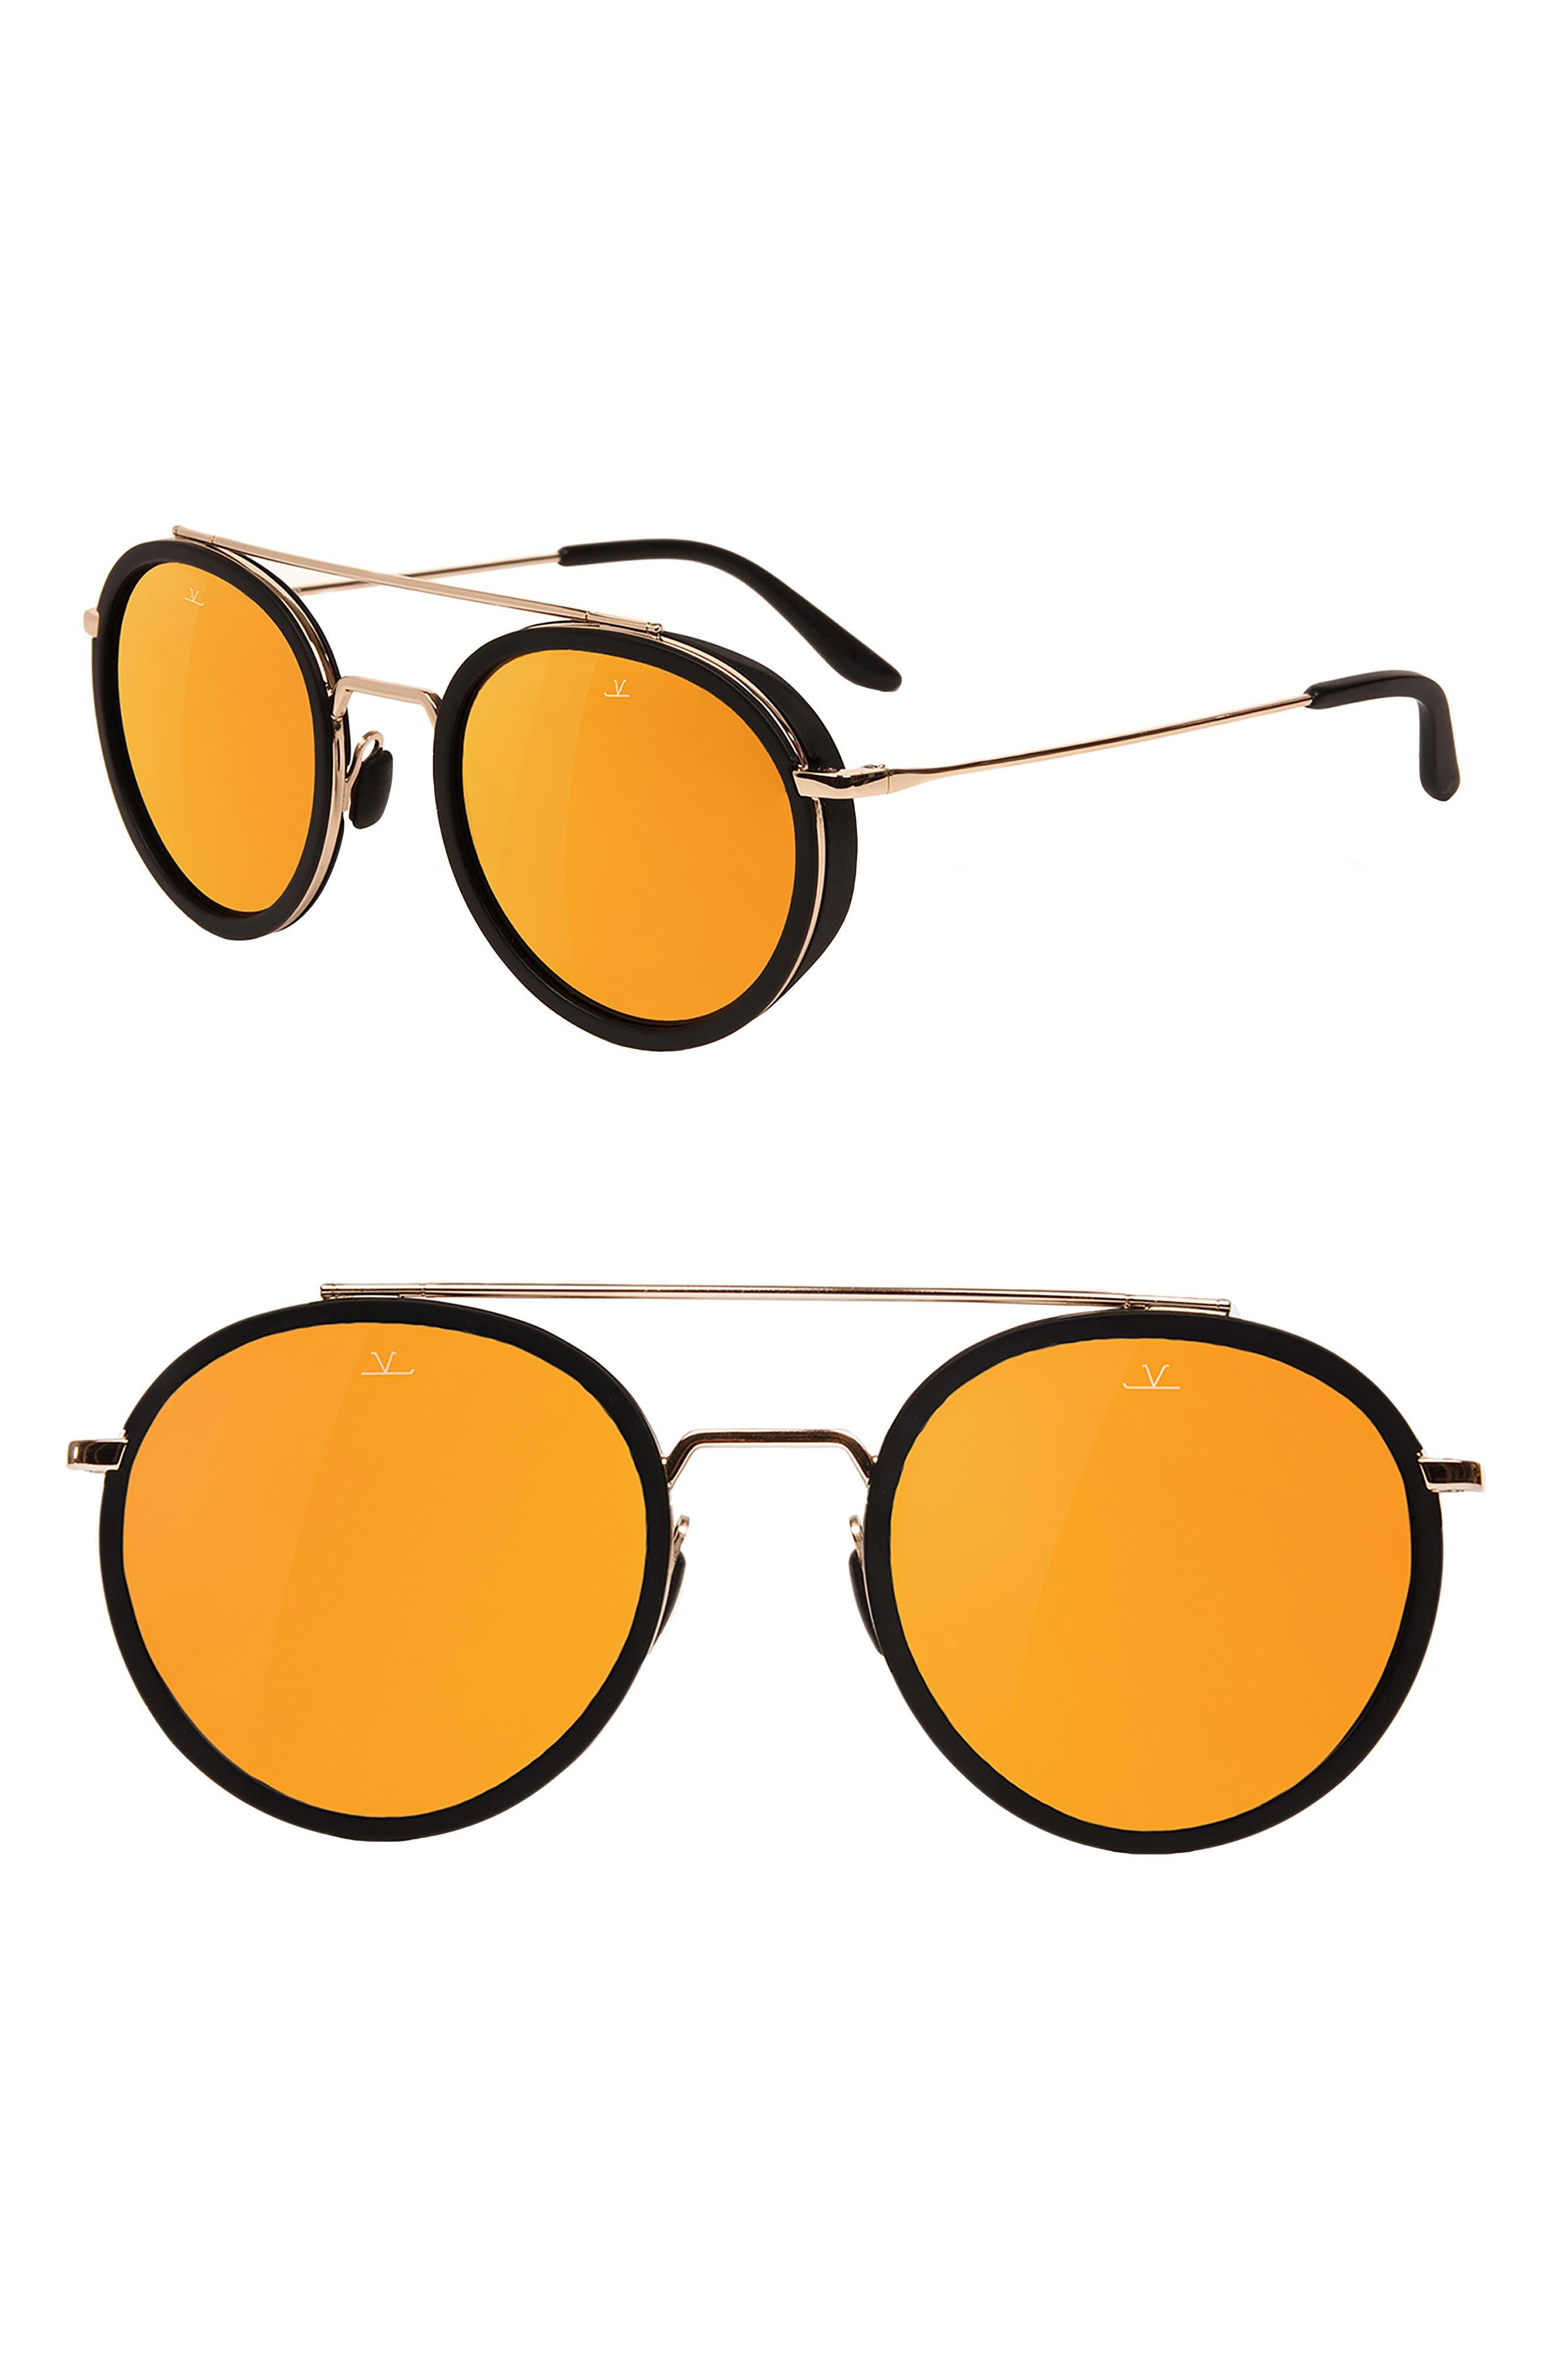 Edge 52mm Round Sunglasses,                         Main,                         color, PURE BROWN GOLD FLASH